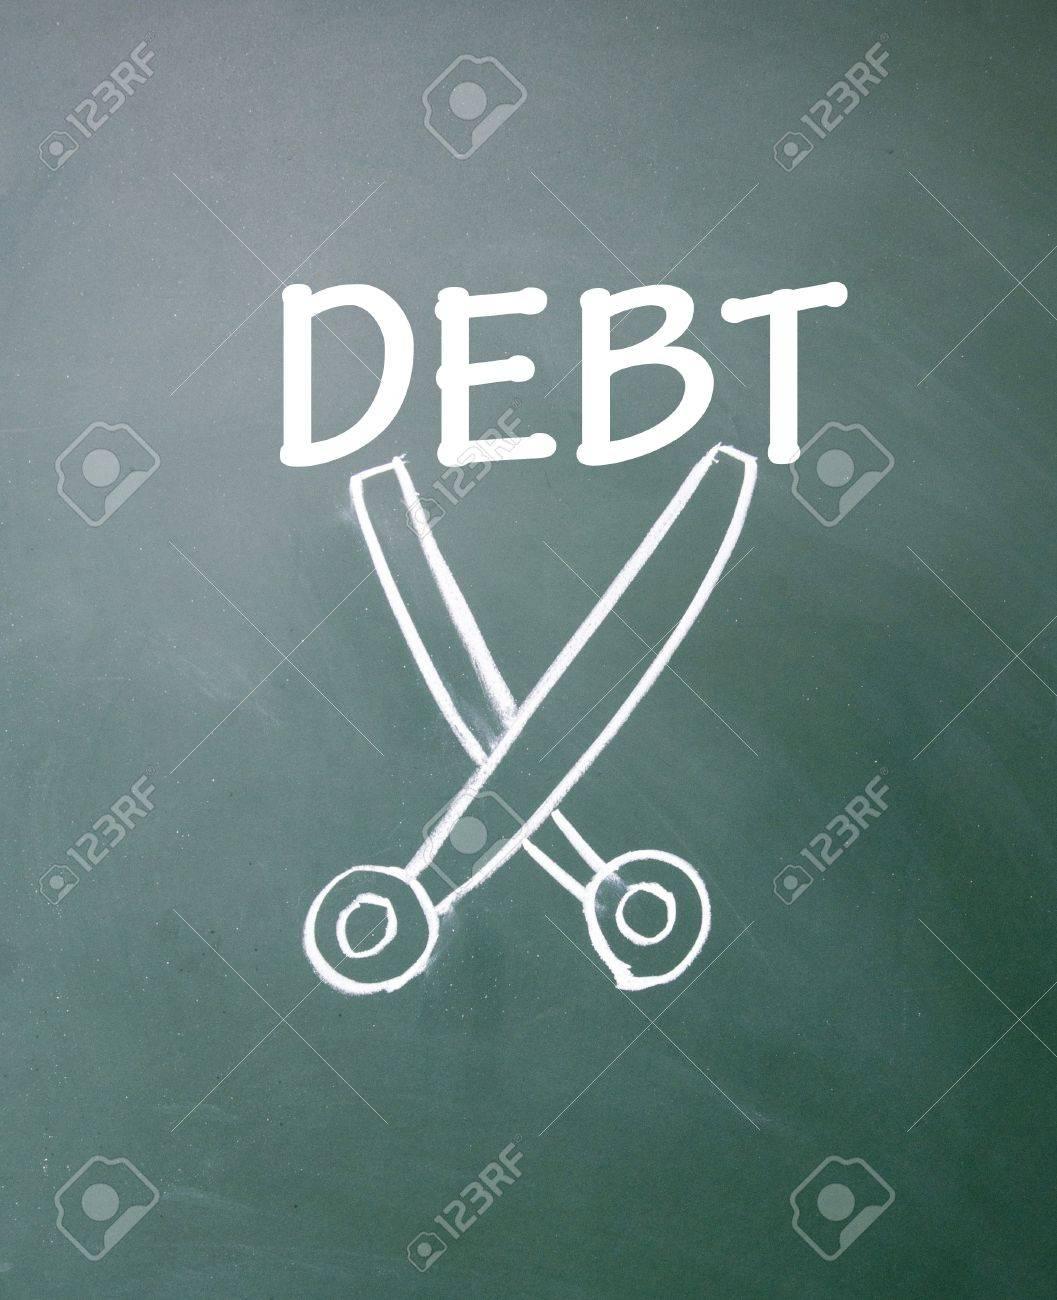 cut debt symbol Stock Photo - 14922302